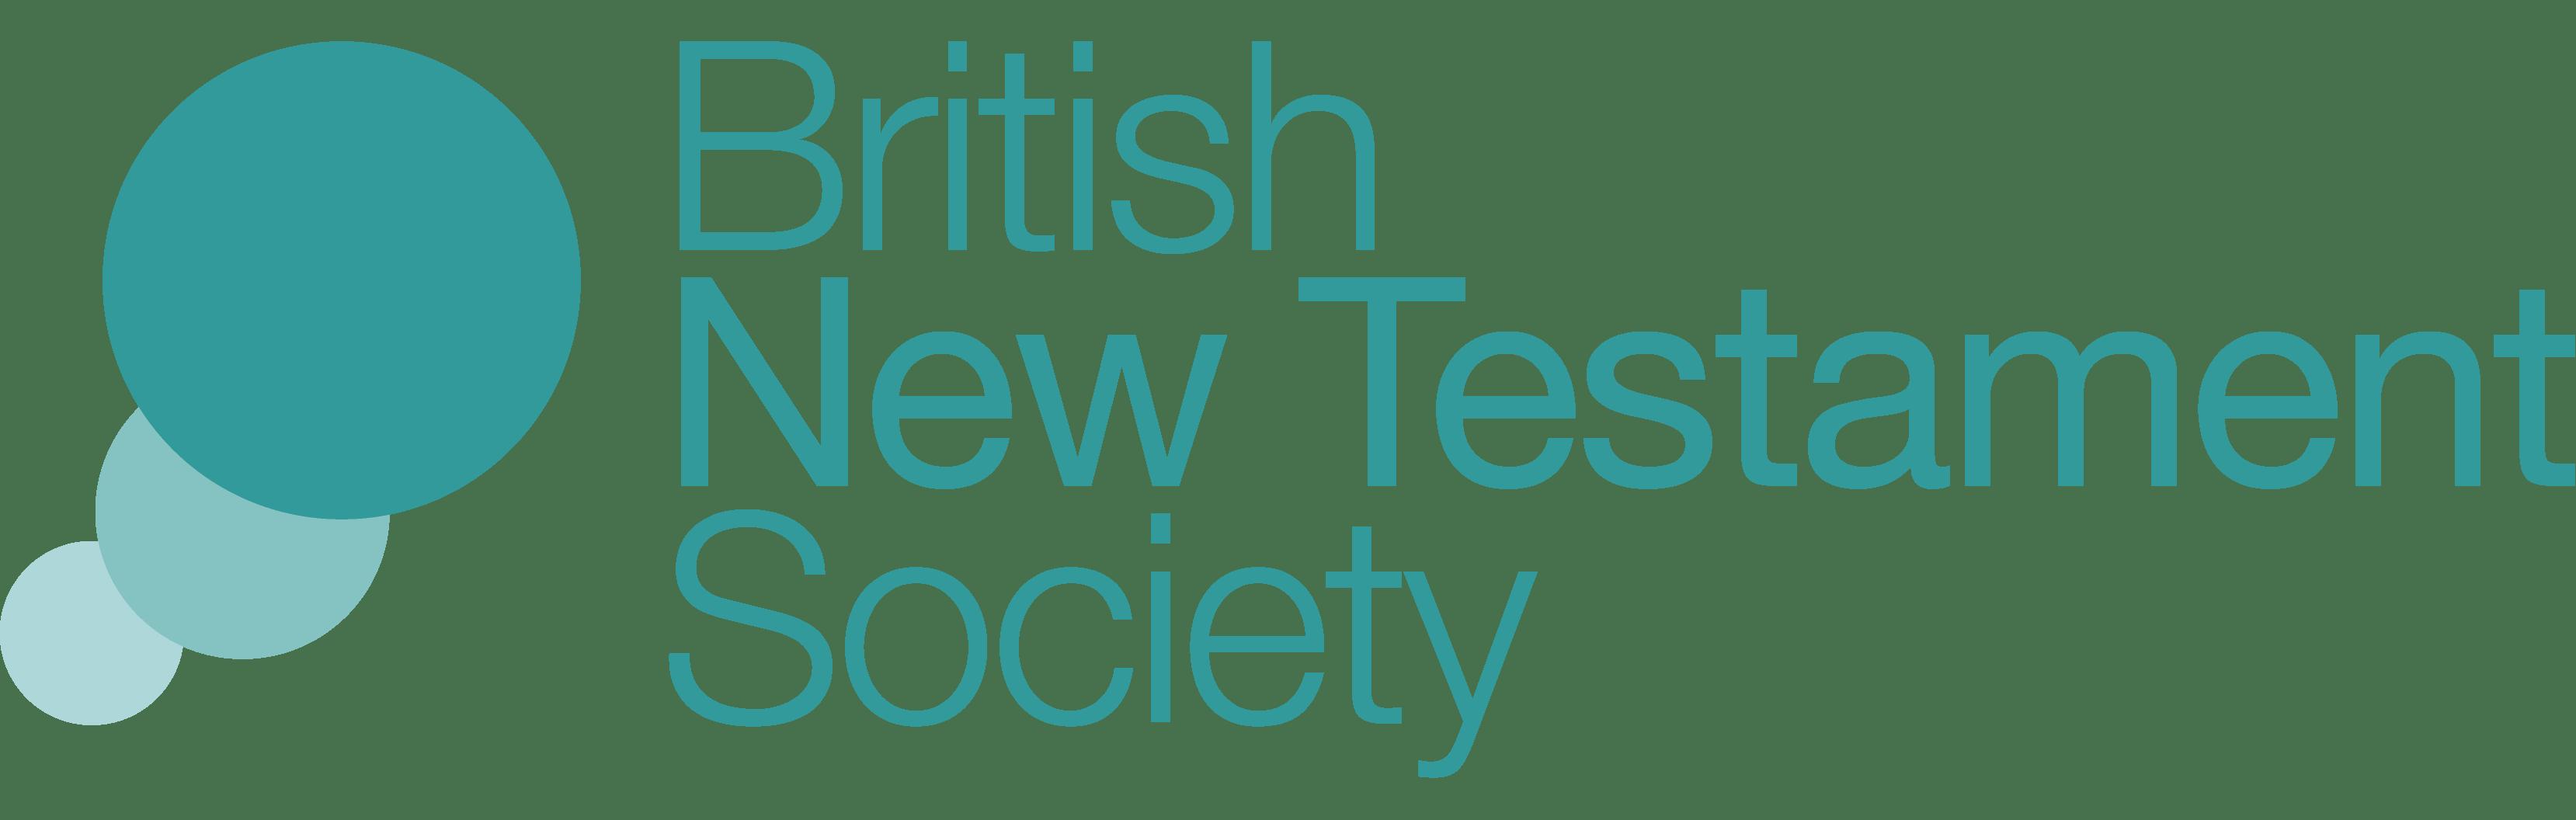 British New Testament Society